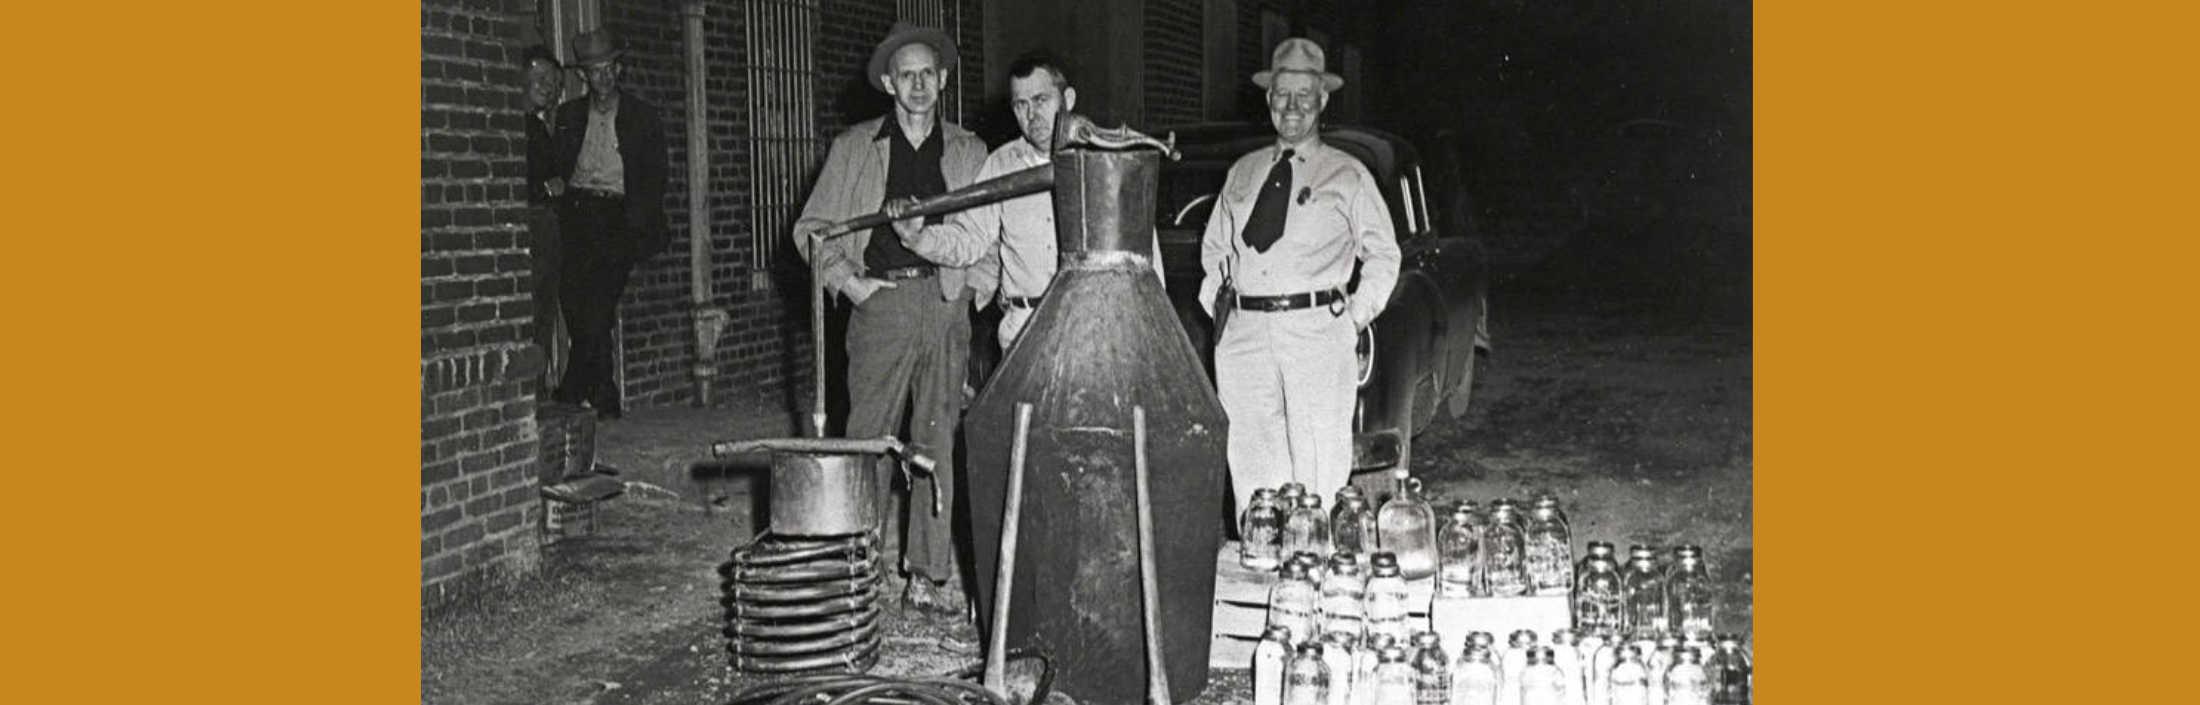 WAY BACK MACHINE: The Great Poplar Island Bootleg Booze Factory of 1929